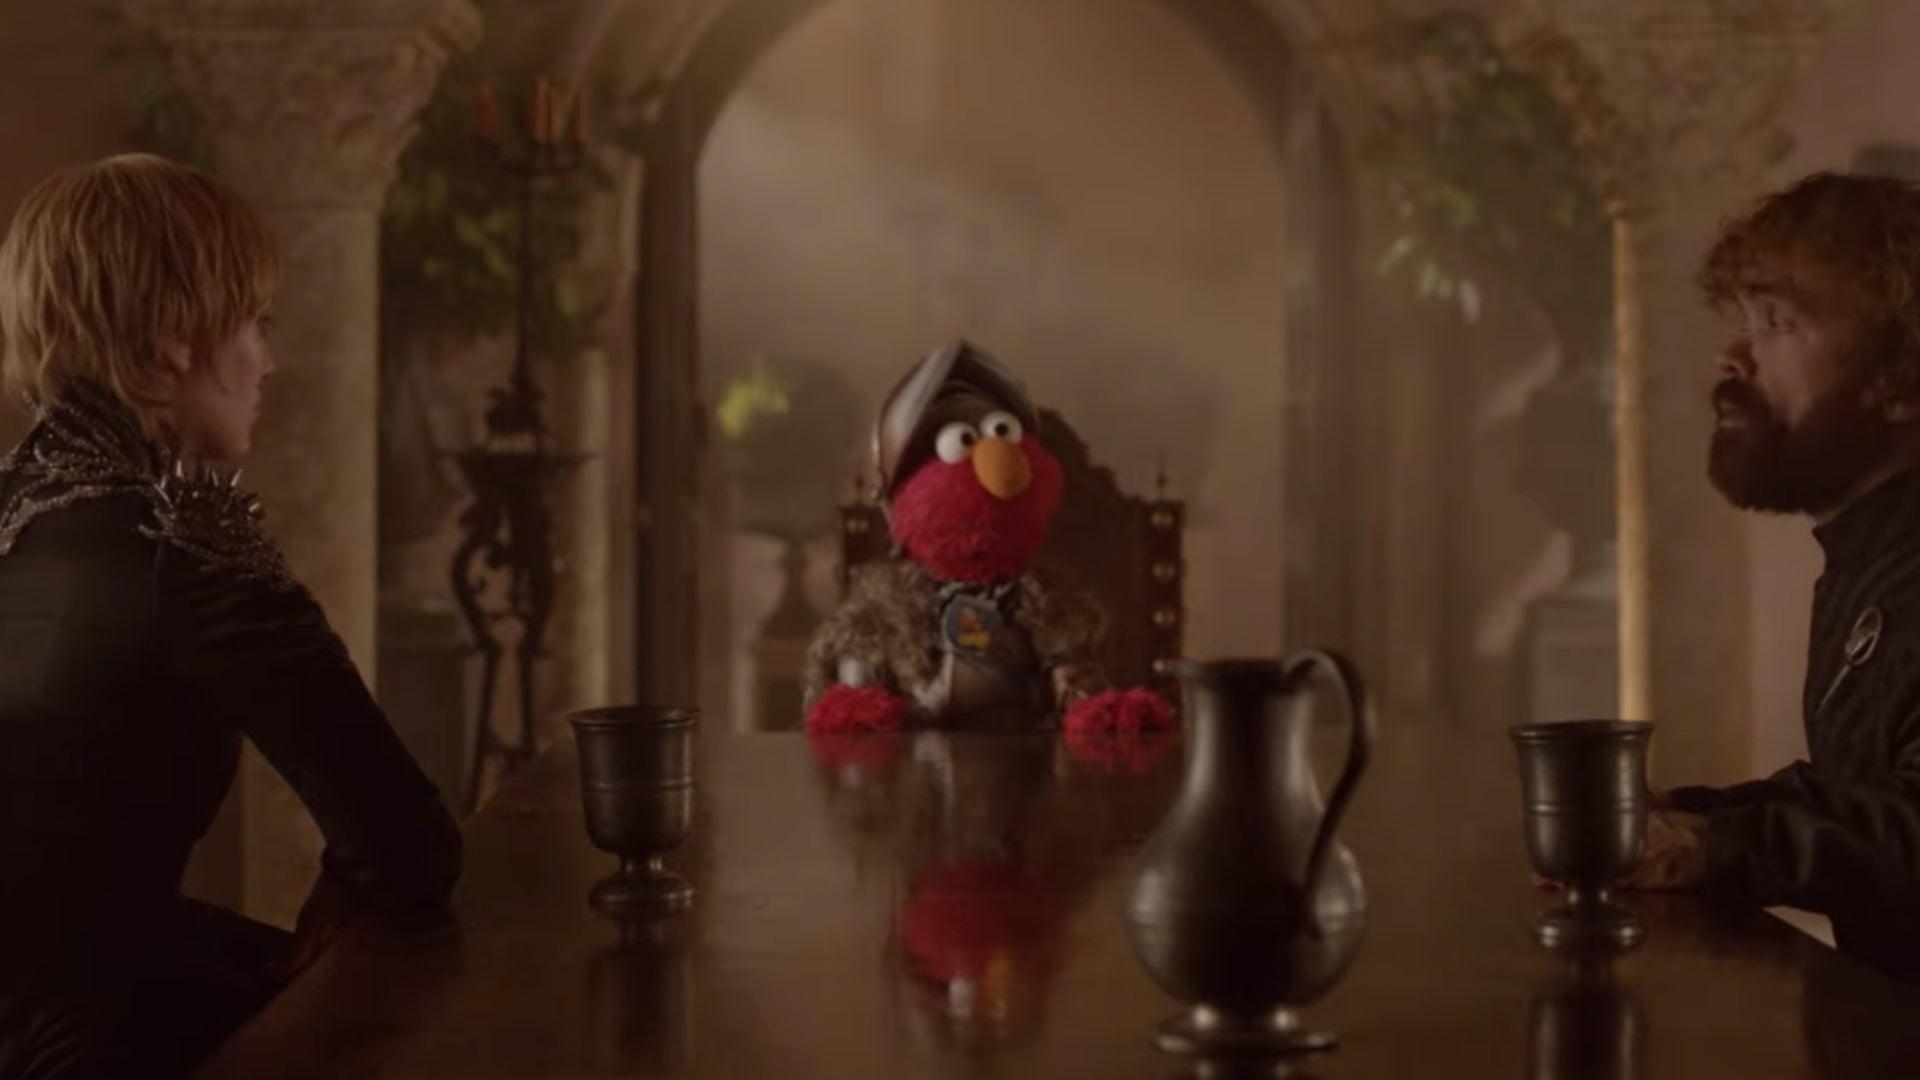 Elmo, Game of Thrones